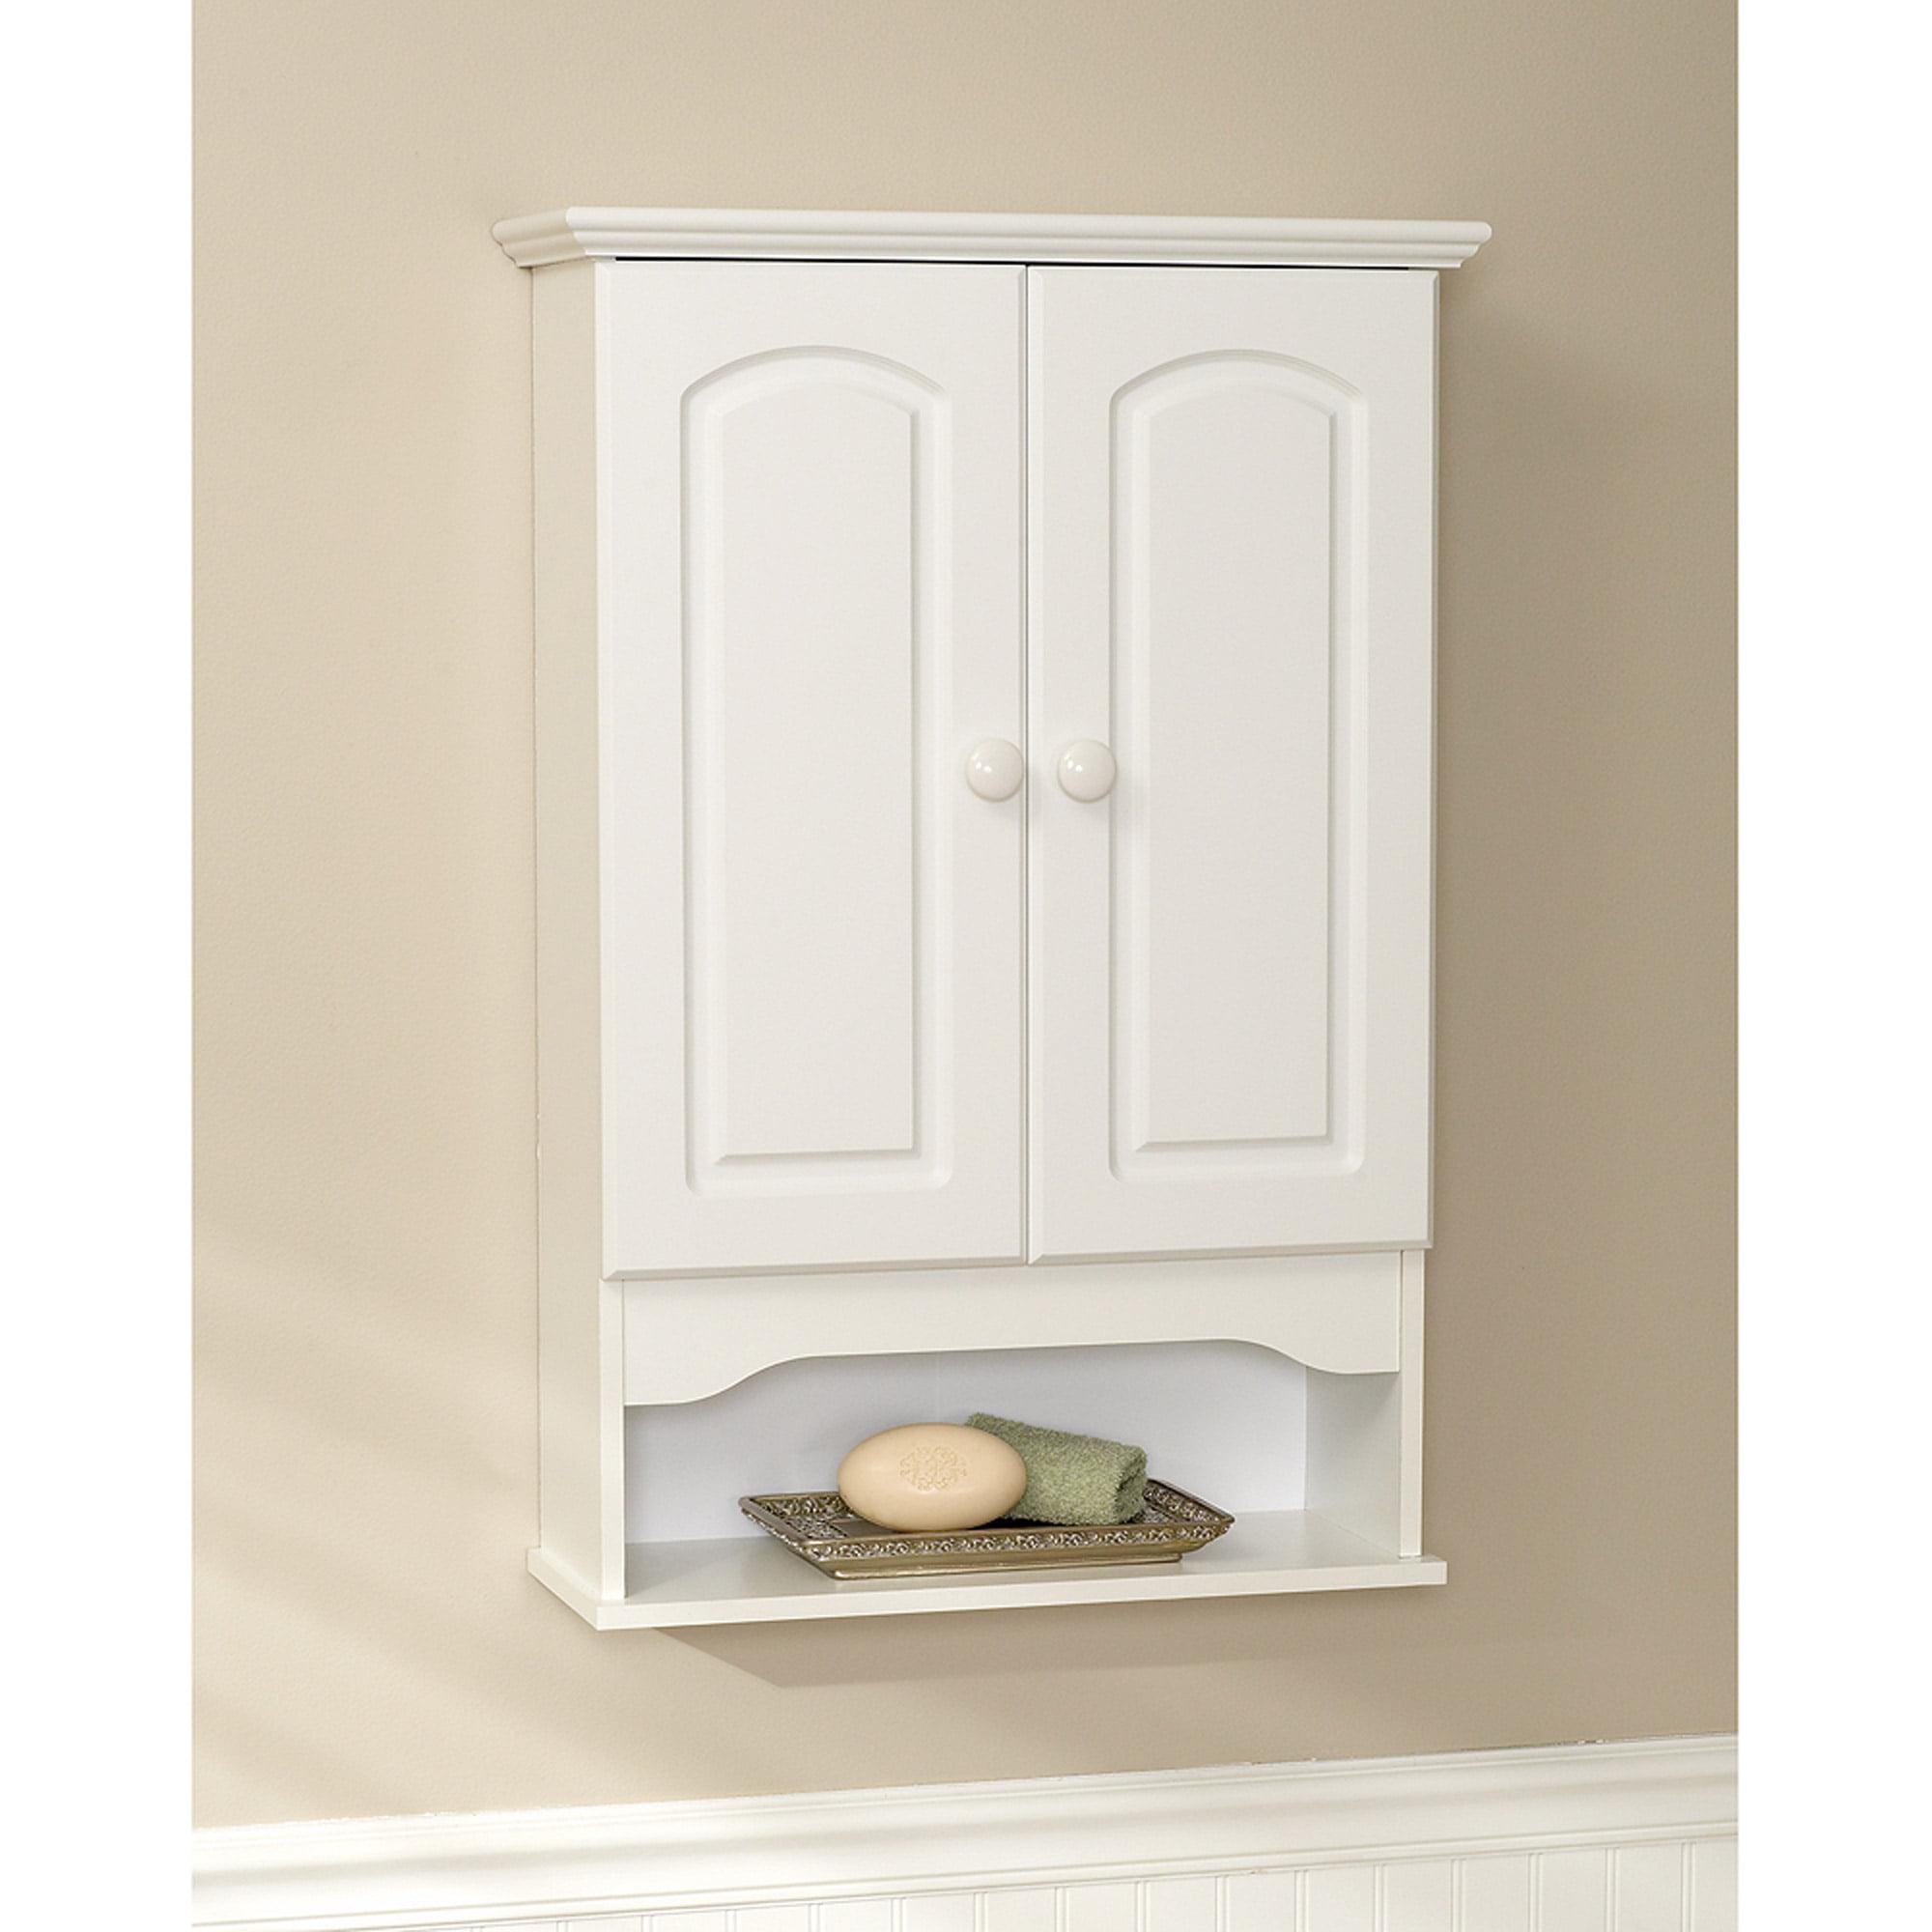 Classic Hartford Wall Cabinet, White - Walmart.com